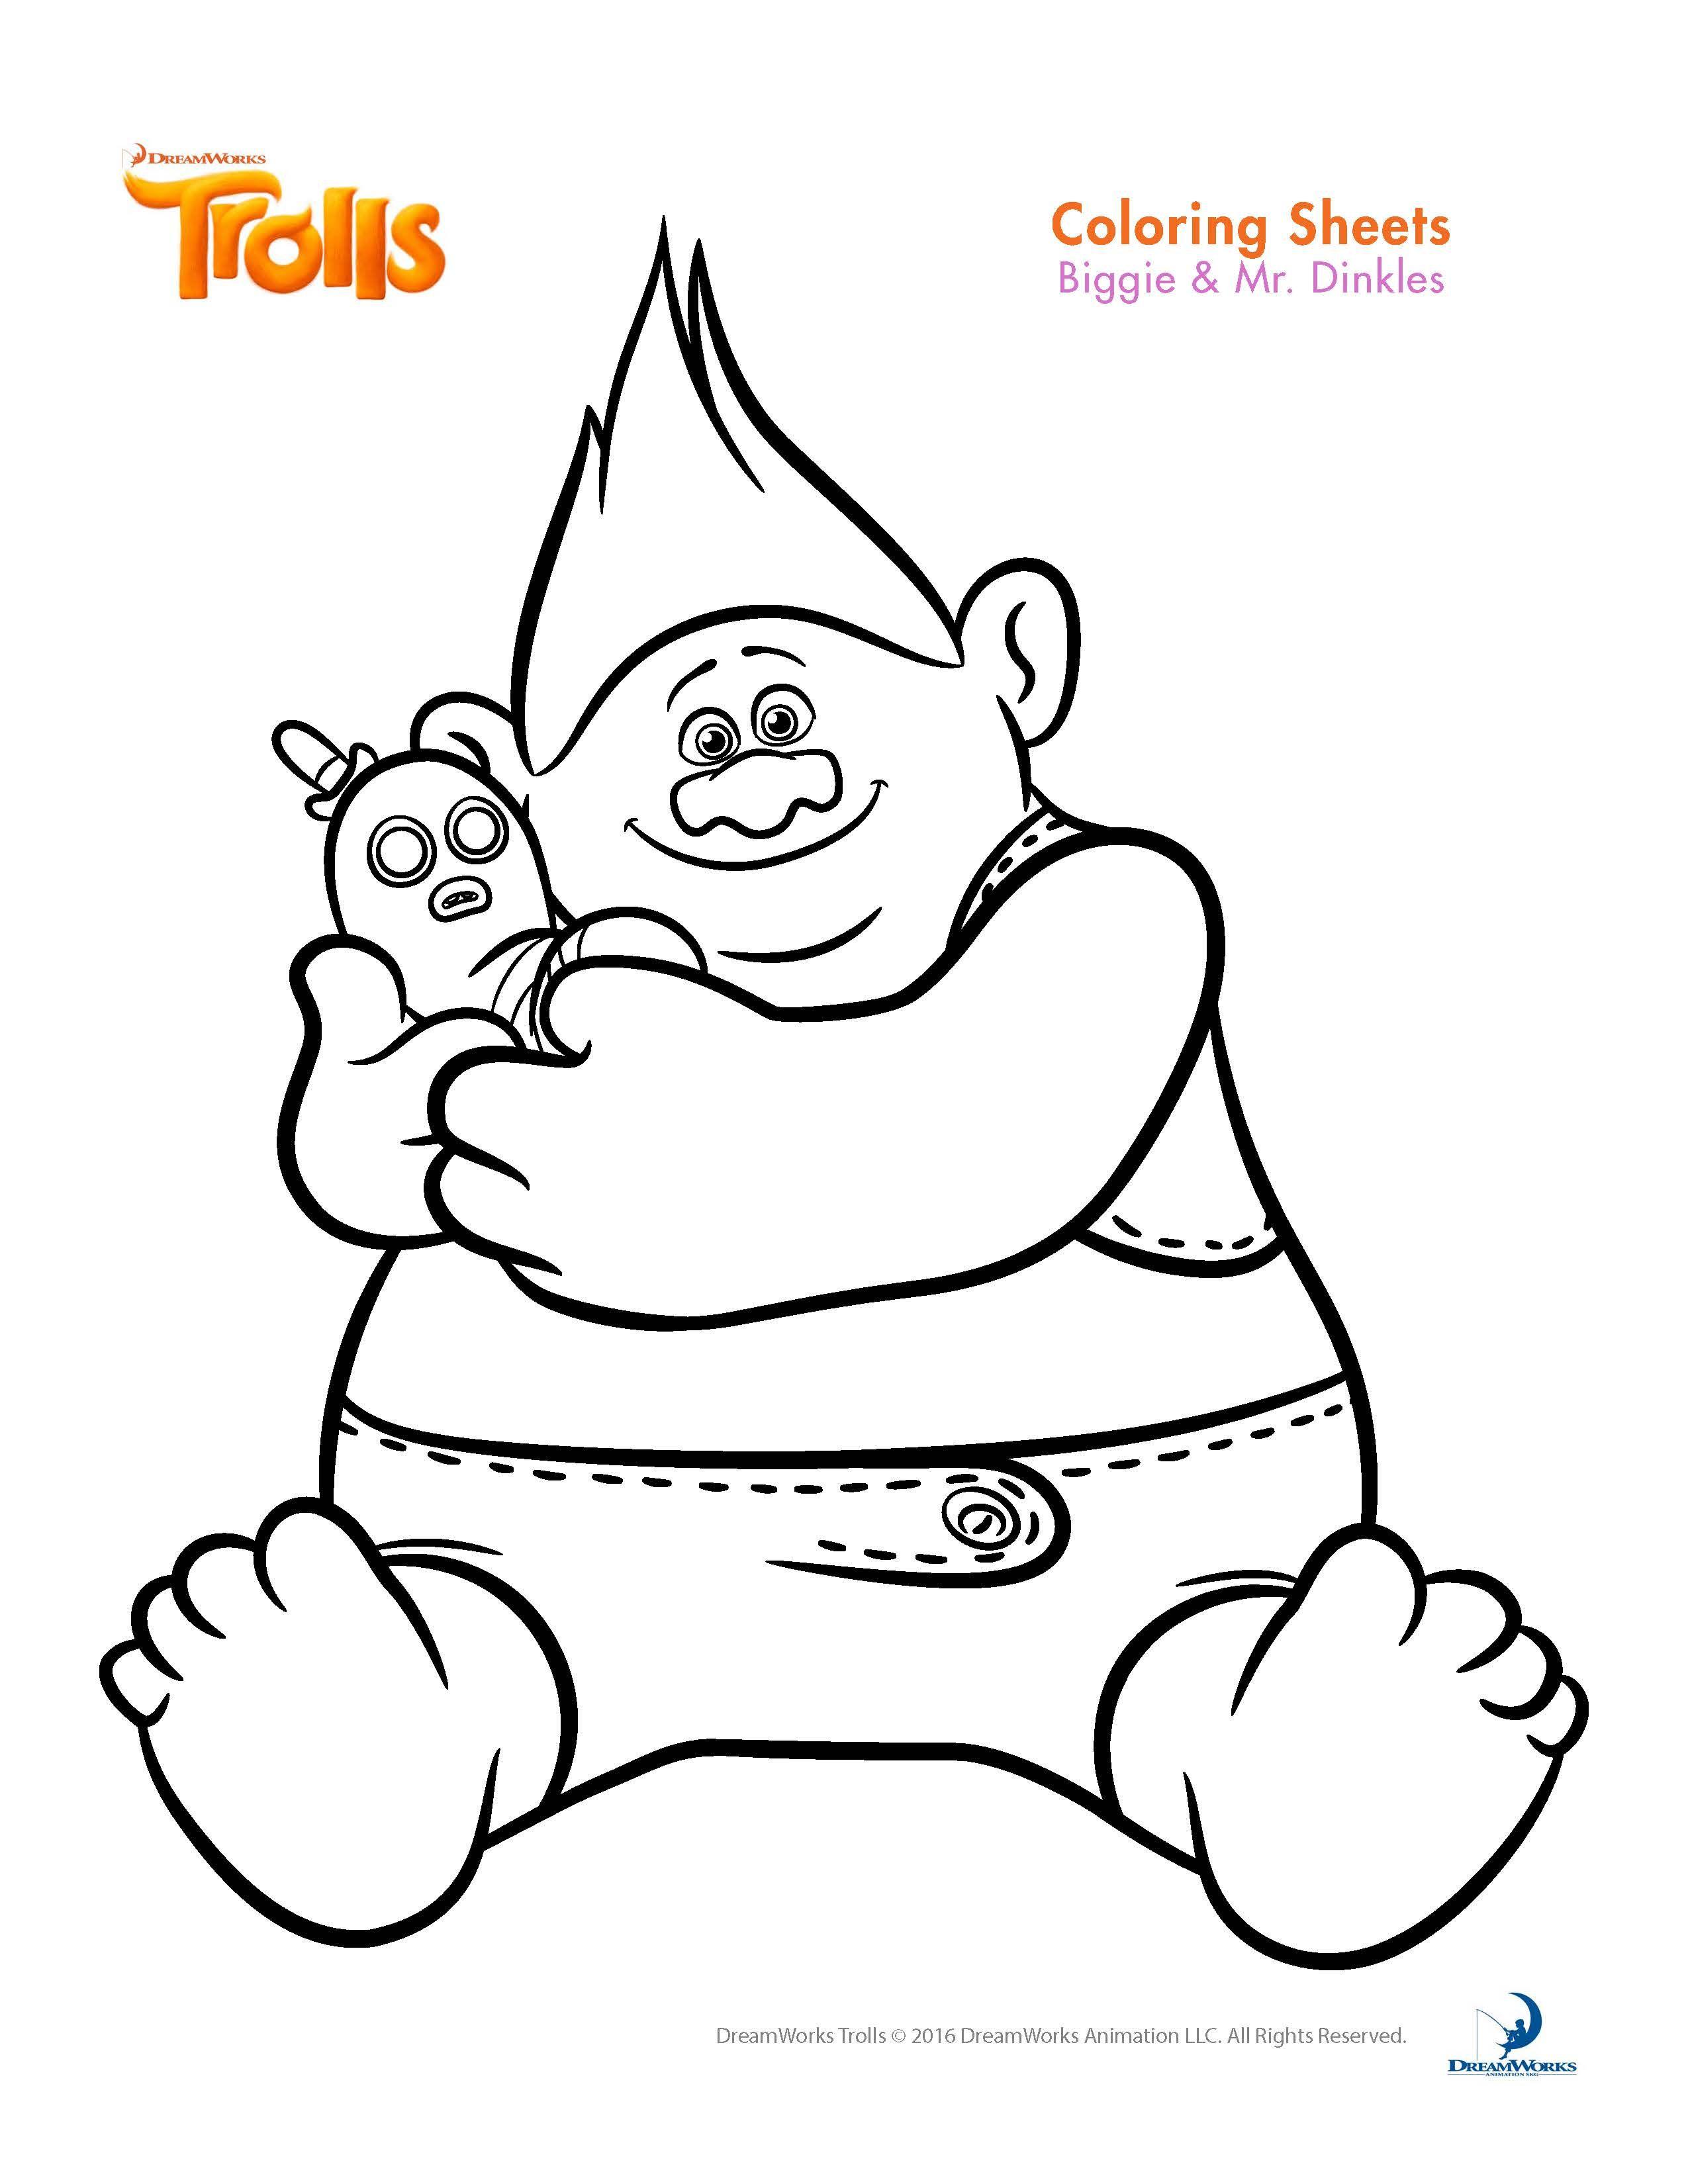 Trolls coloring pages satin and chenille - Trolls Para Colorear Imagenes Para Colorear Dibujos